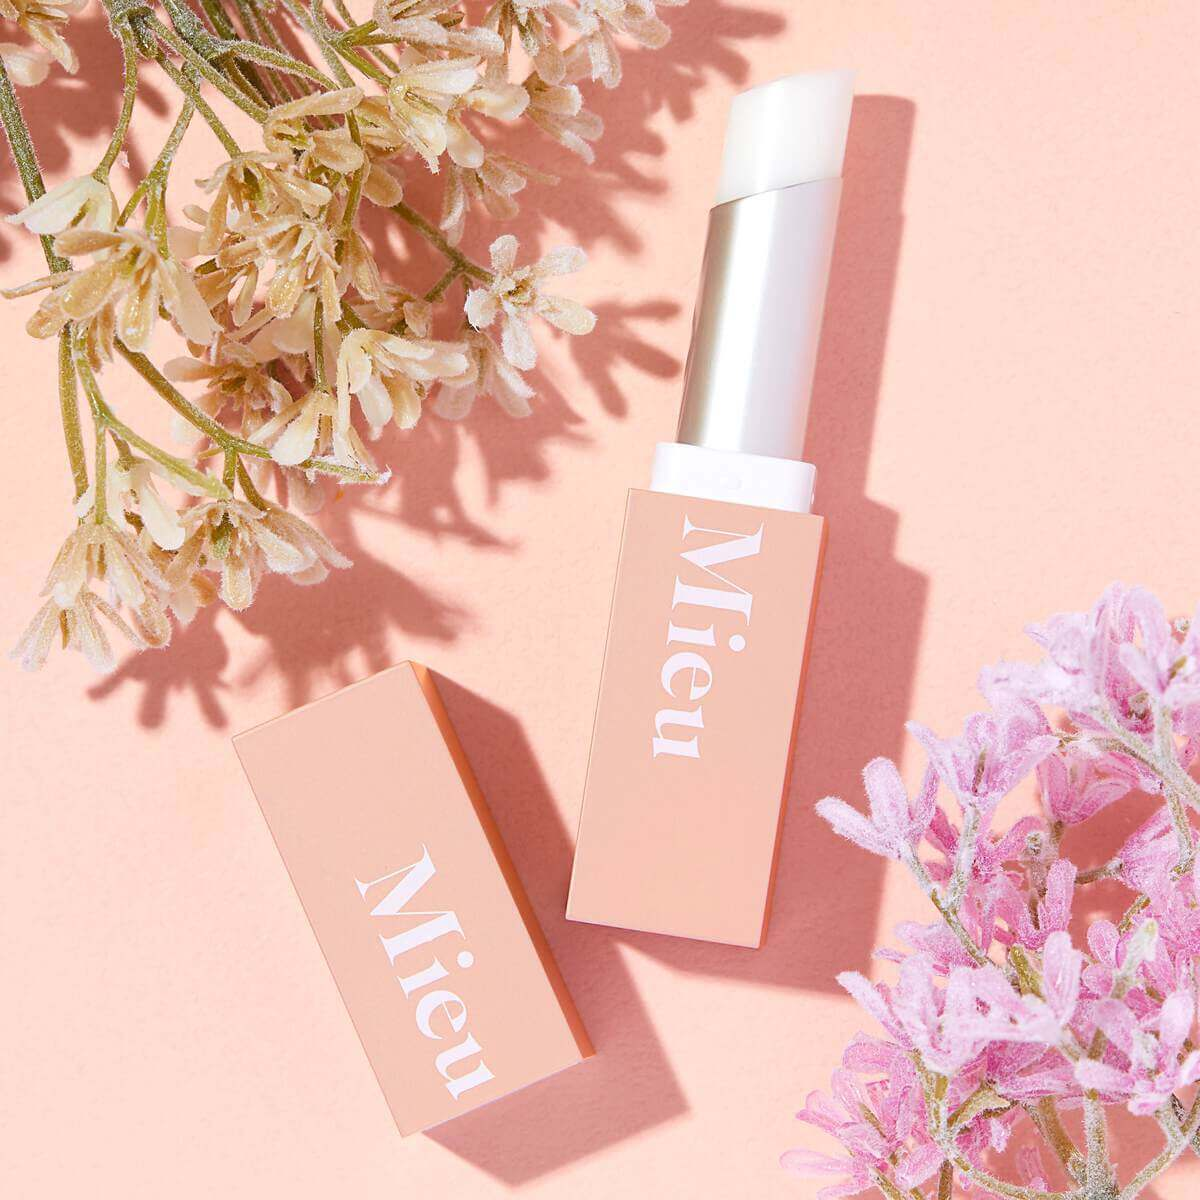 MieuMieuのエスティックのLune-parfum